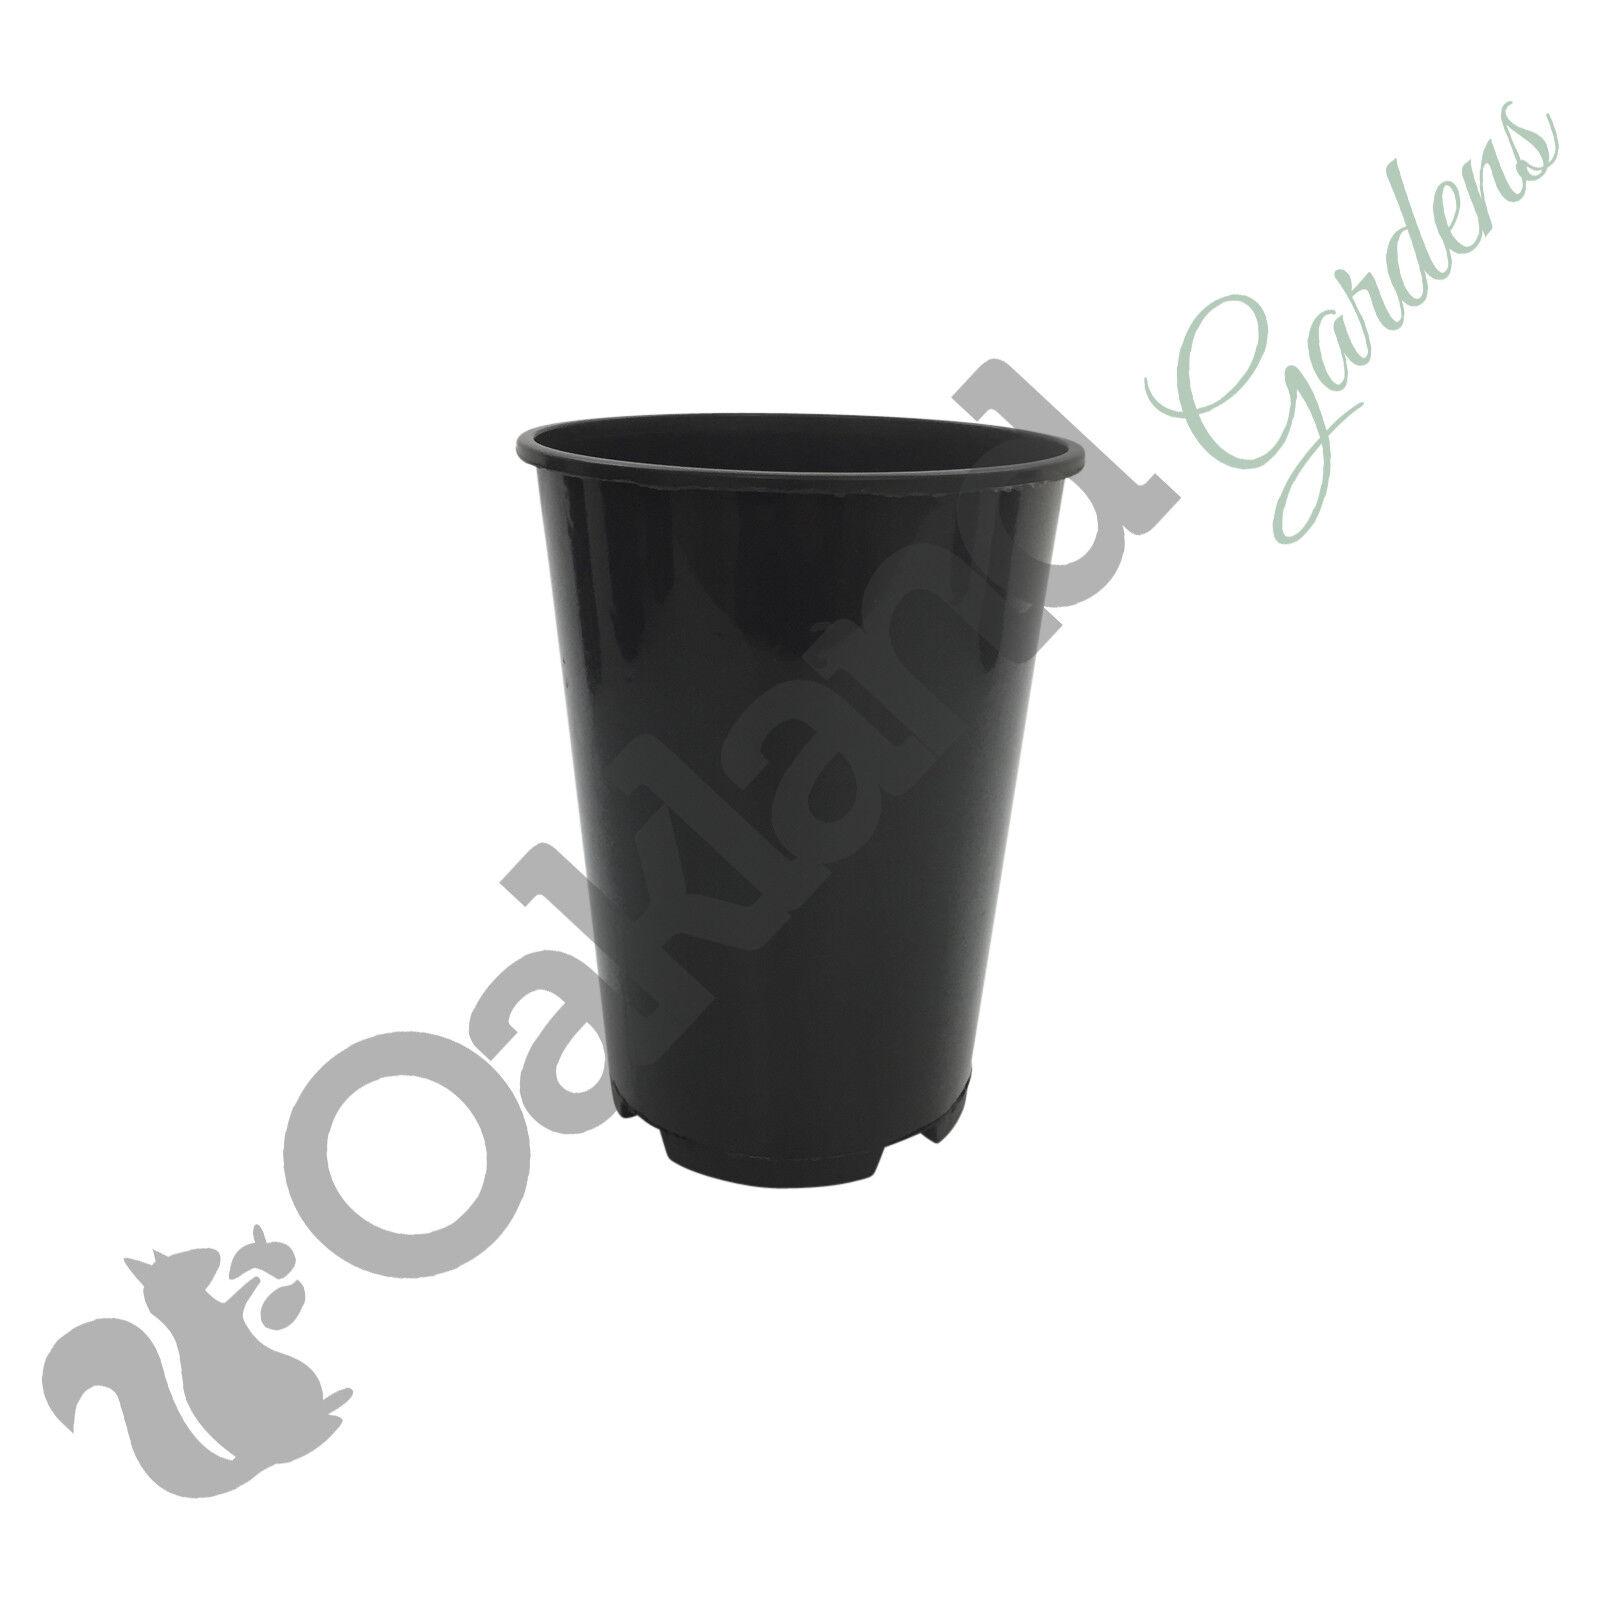 50 x Deep Rose Pots 2 Litre L Lt Plant Flower Pot Tall Plastic Black Strong